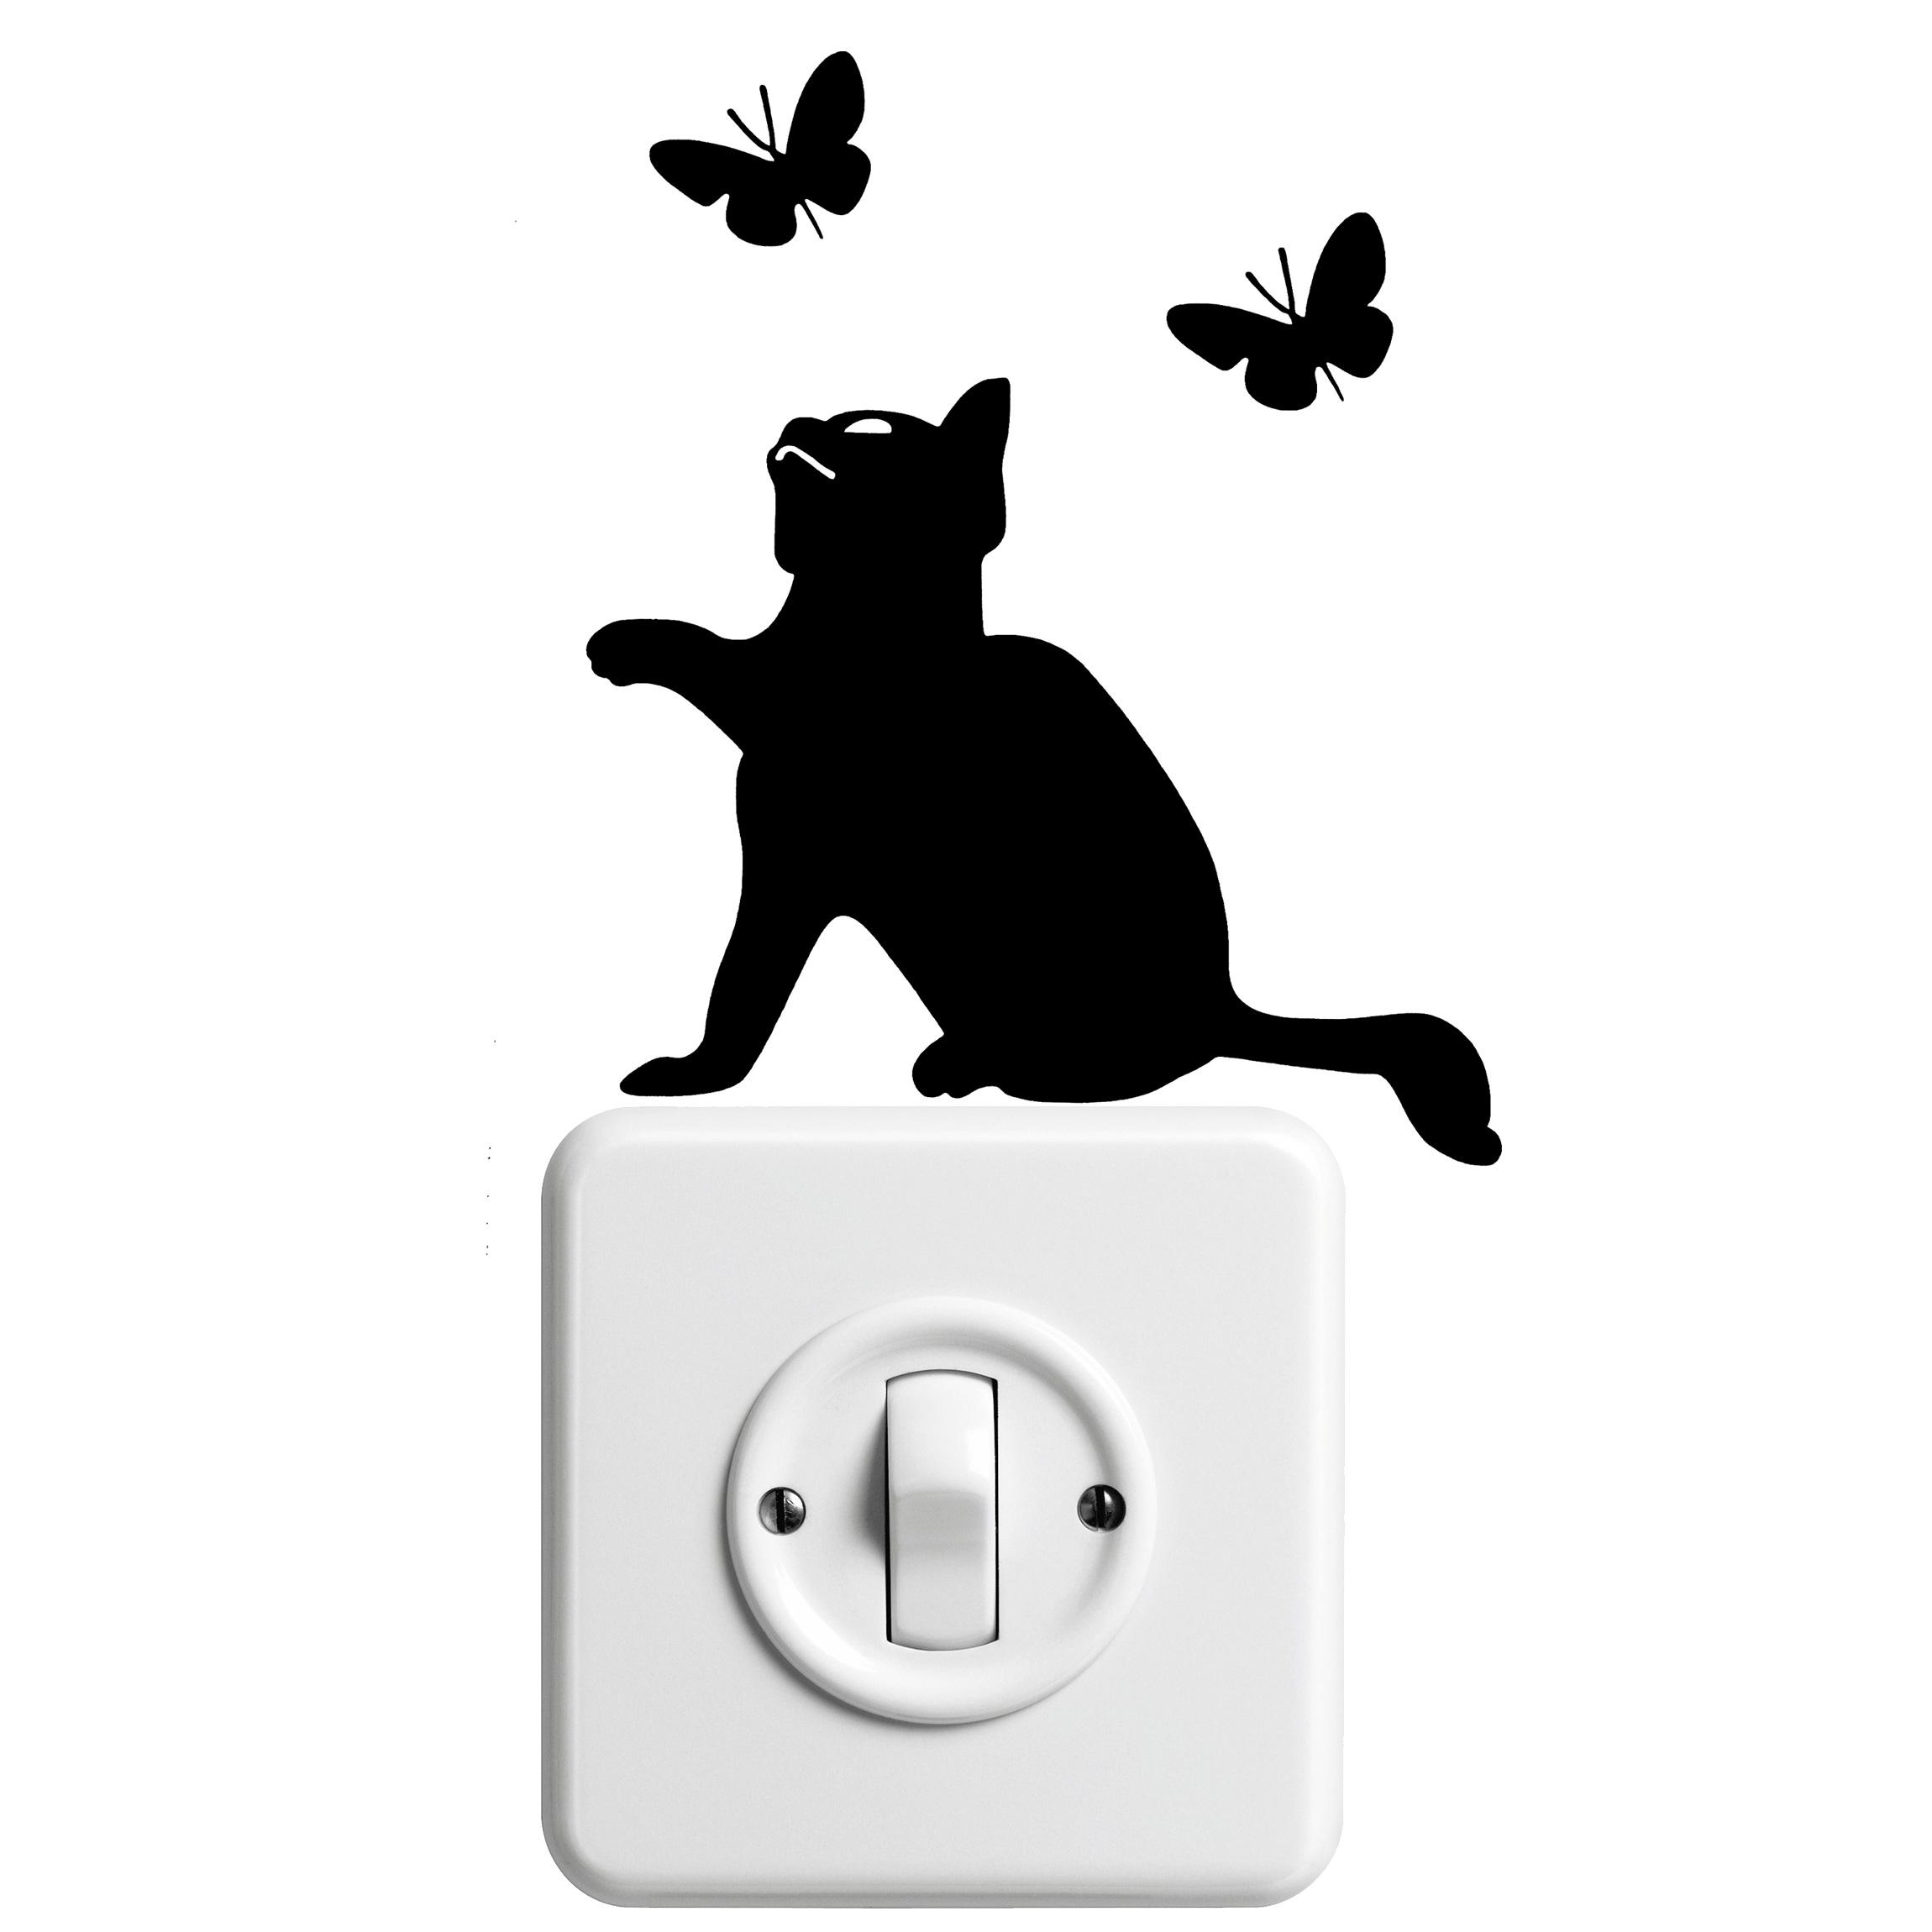 Silhouette chat dessin galerie tatouage - Tatouage silhouette chat ...